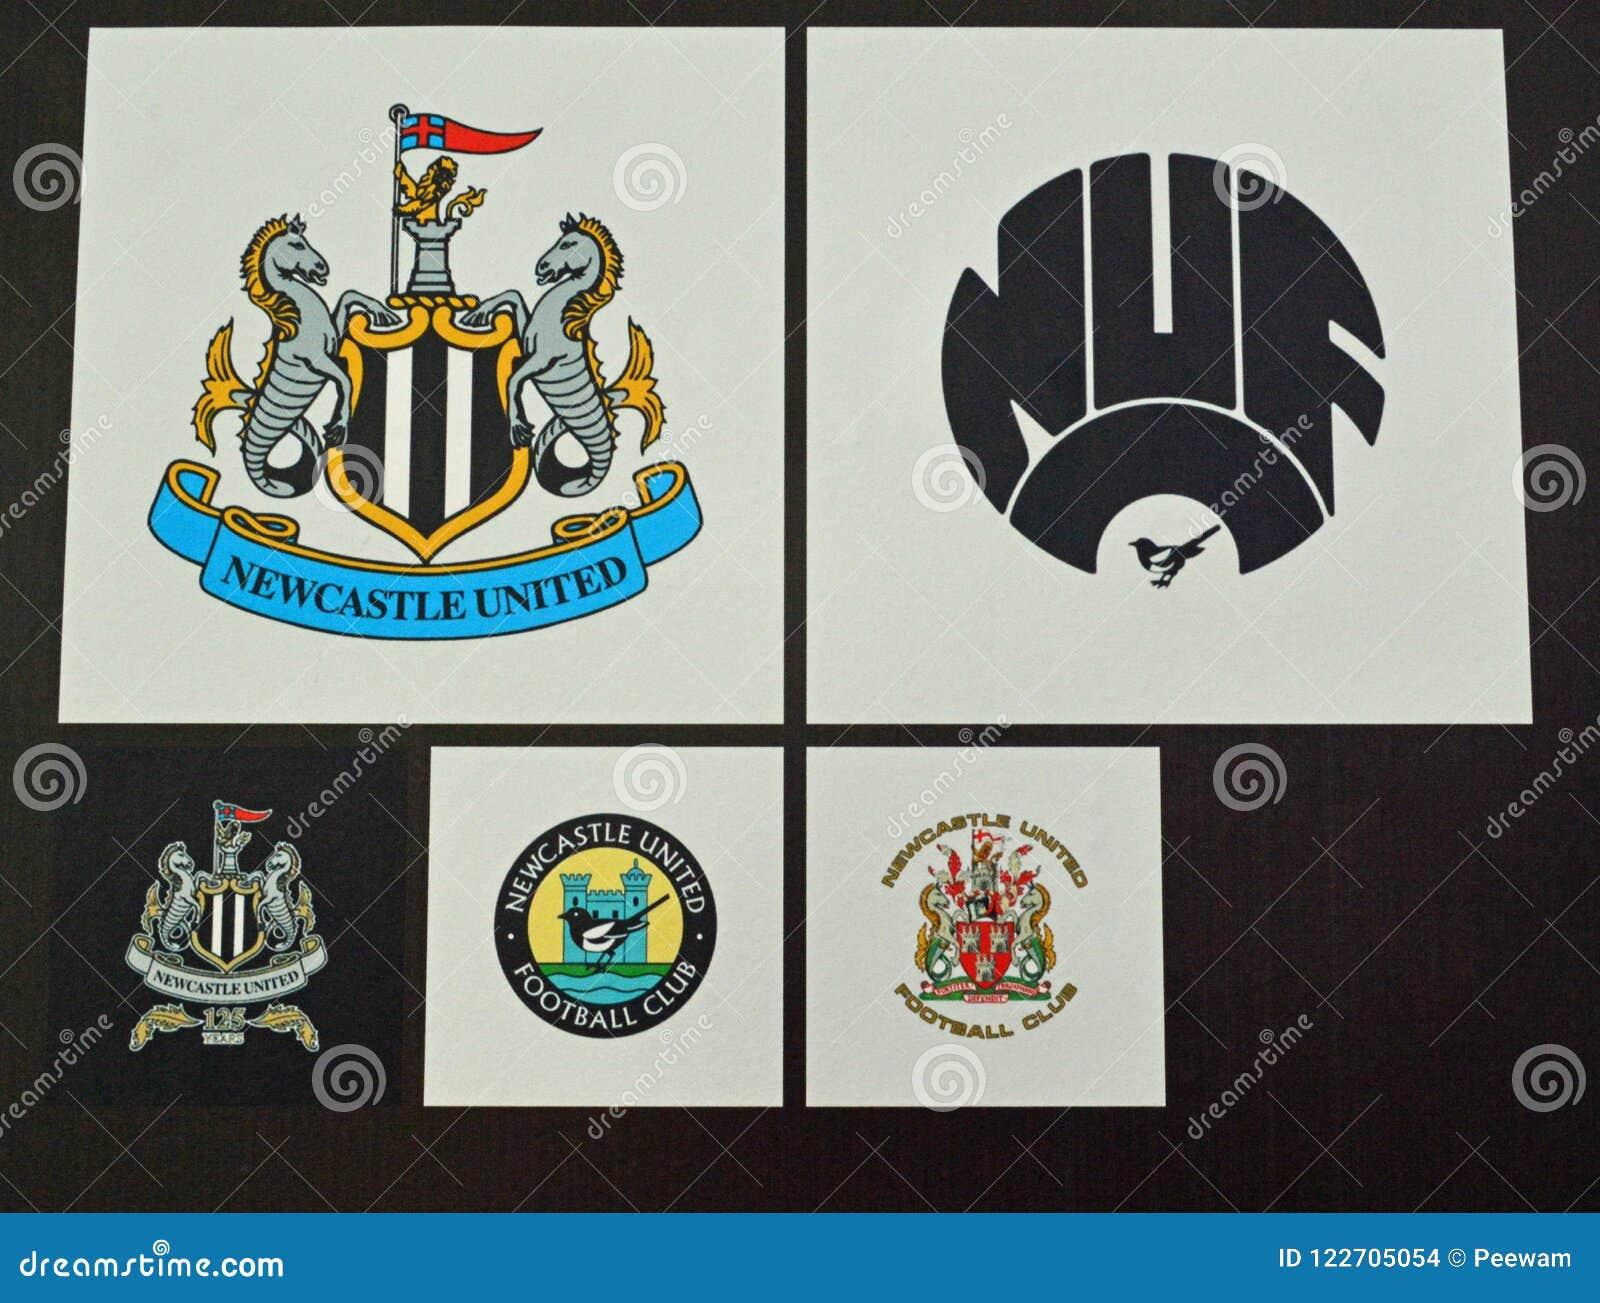 Newcastle United Football Club Badges Editorial Stock Image Image Of History United 122705054